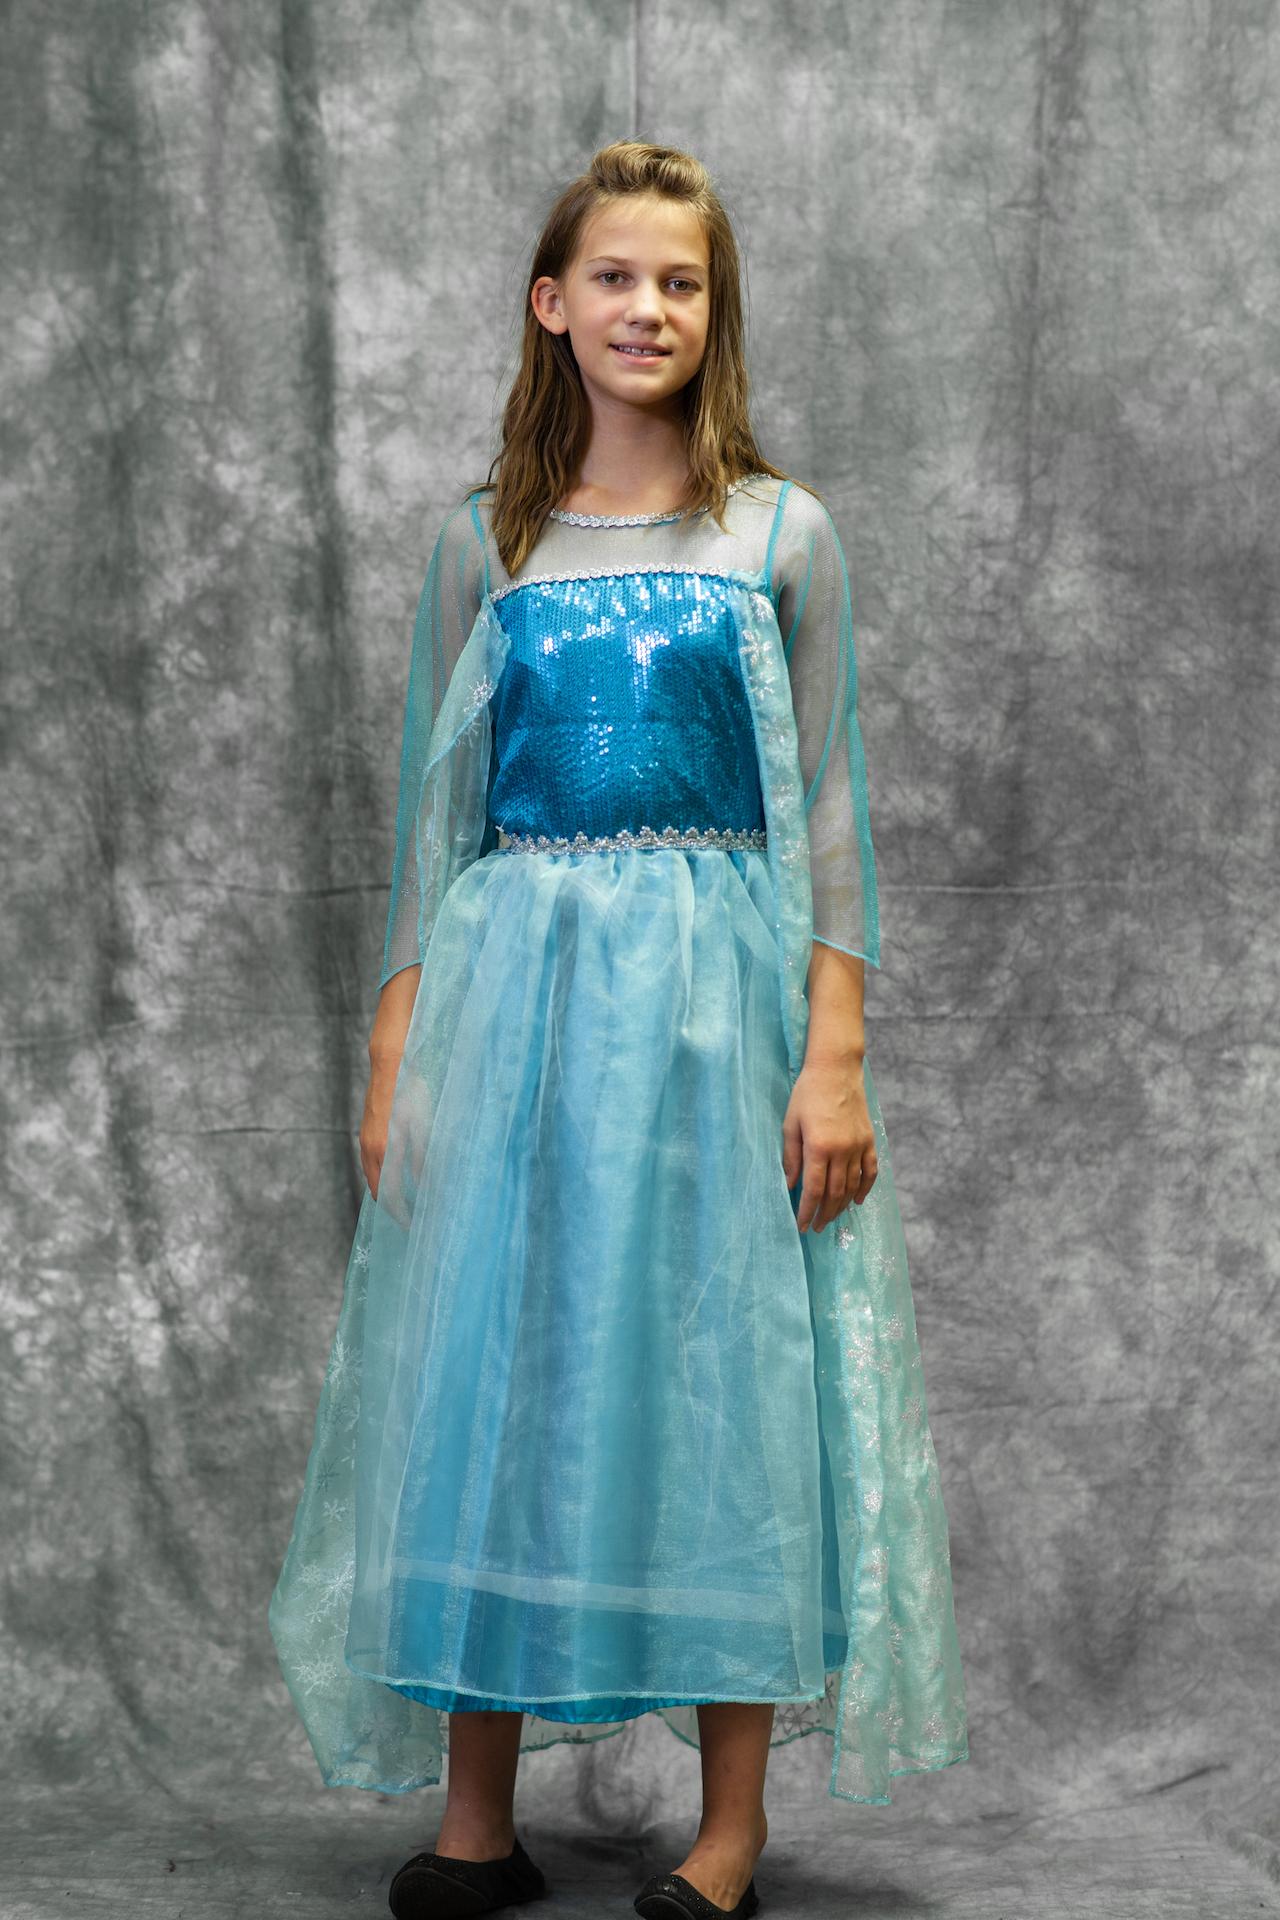 Frozen Elsa Costume vs2